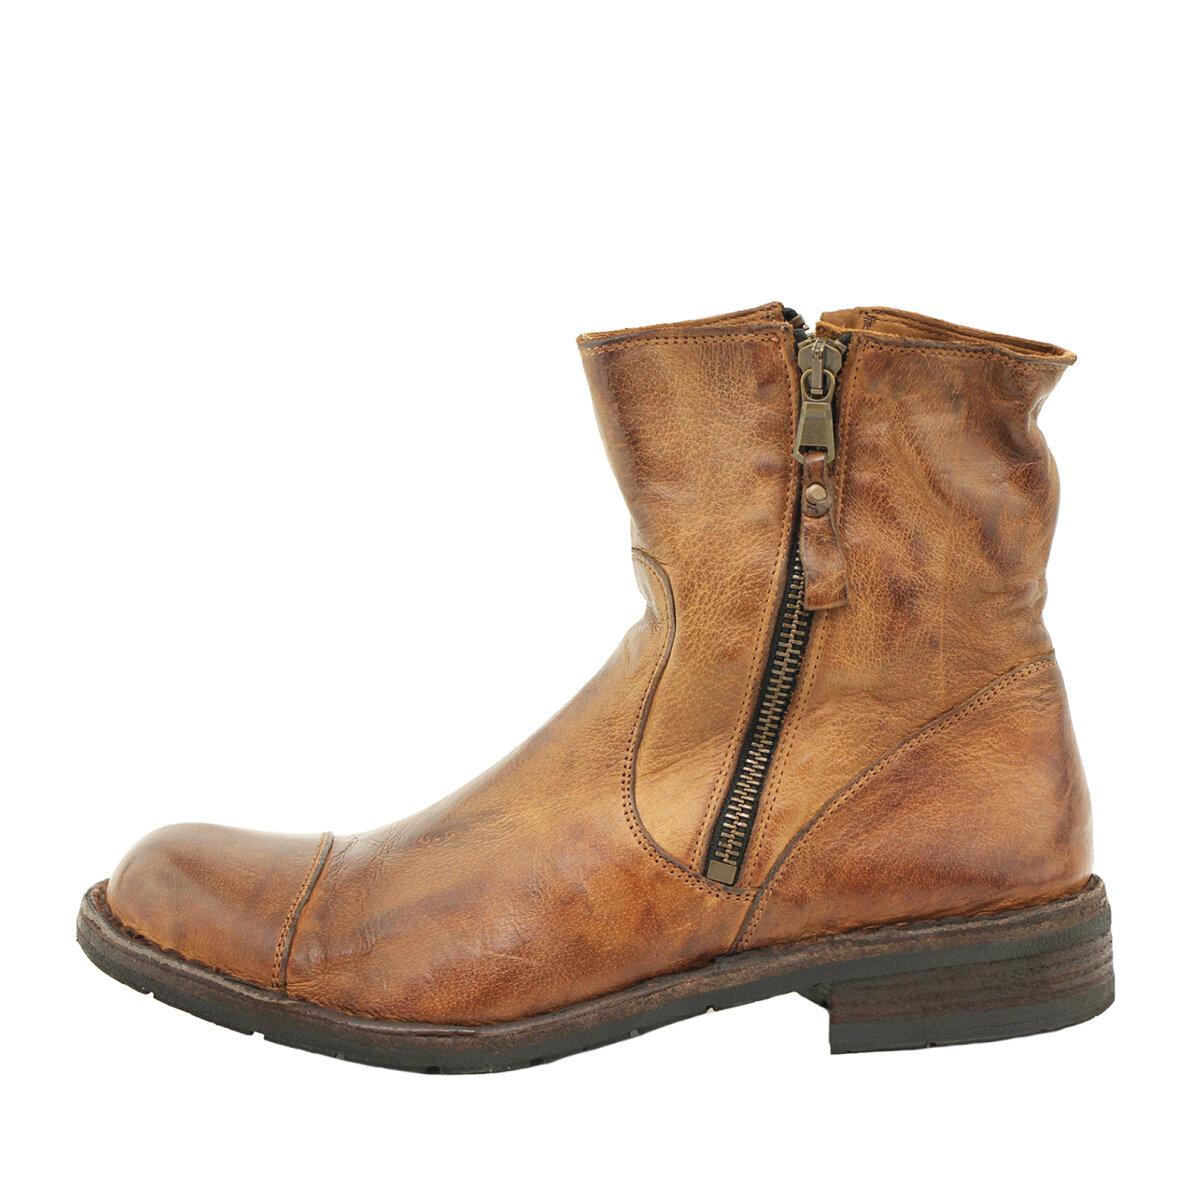 5ed762d1d33 Bubetti - Bubetti 6682 lys brun damestøvle i skind ...